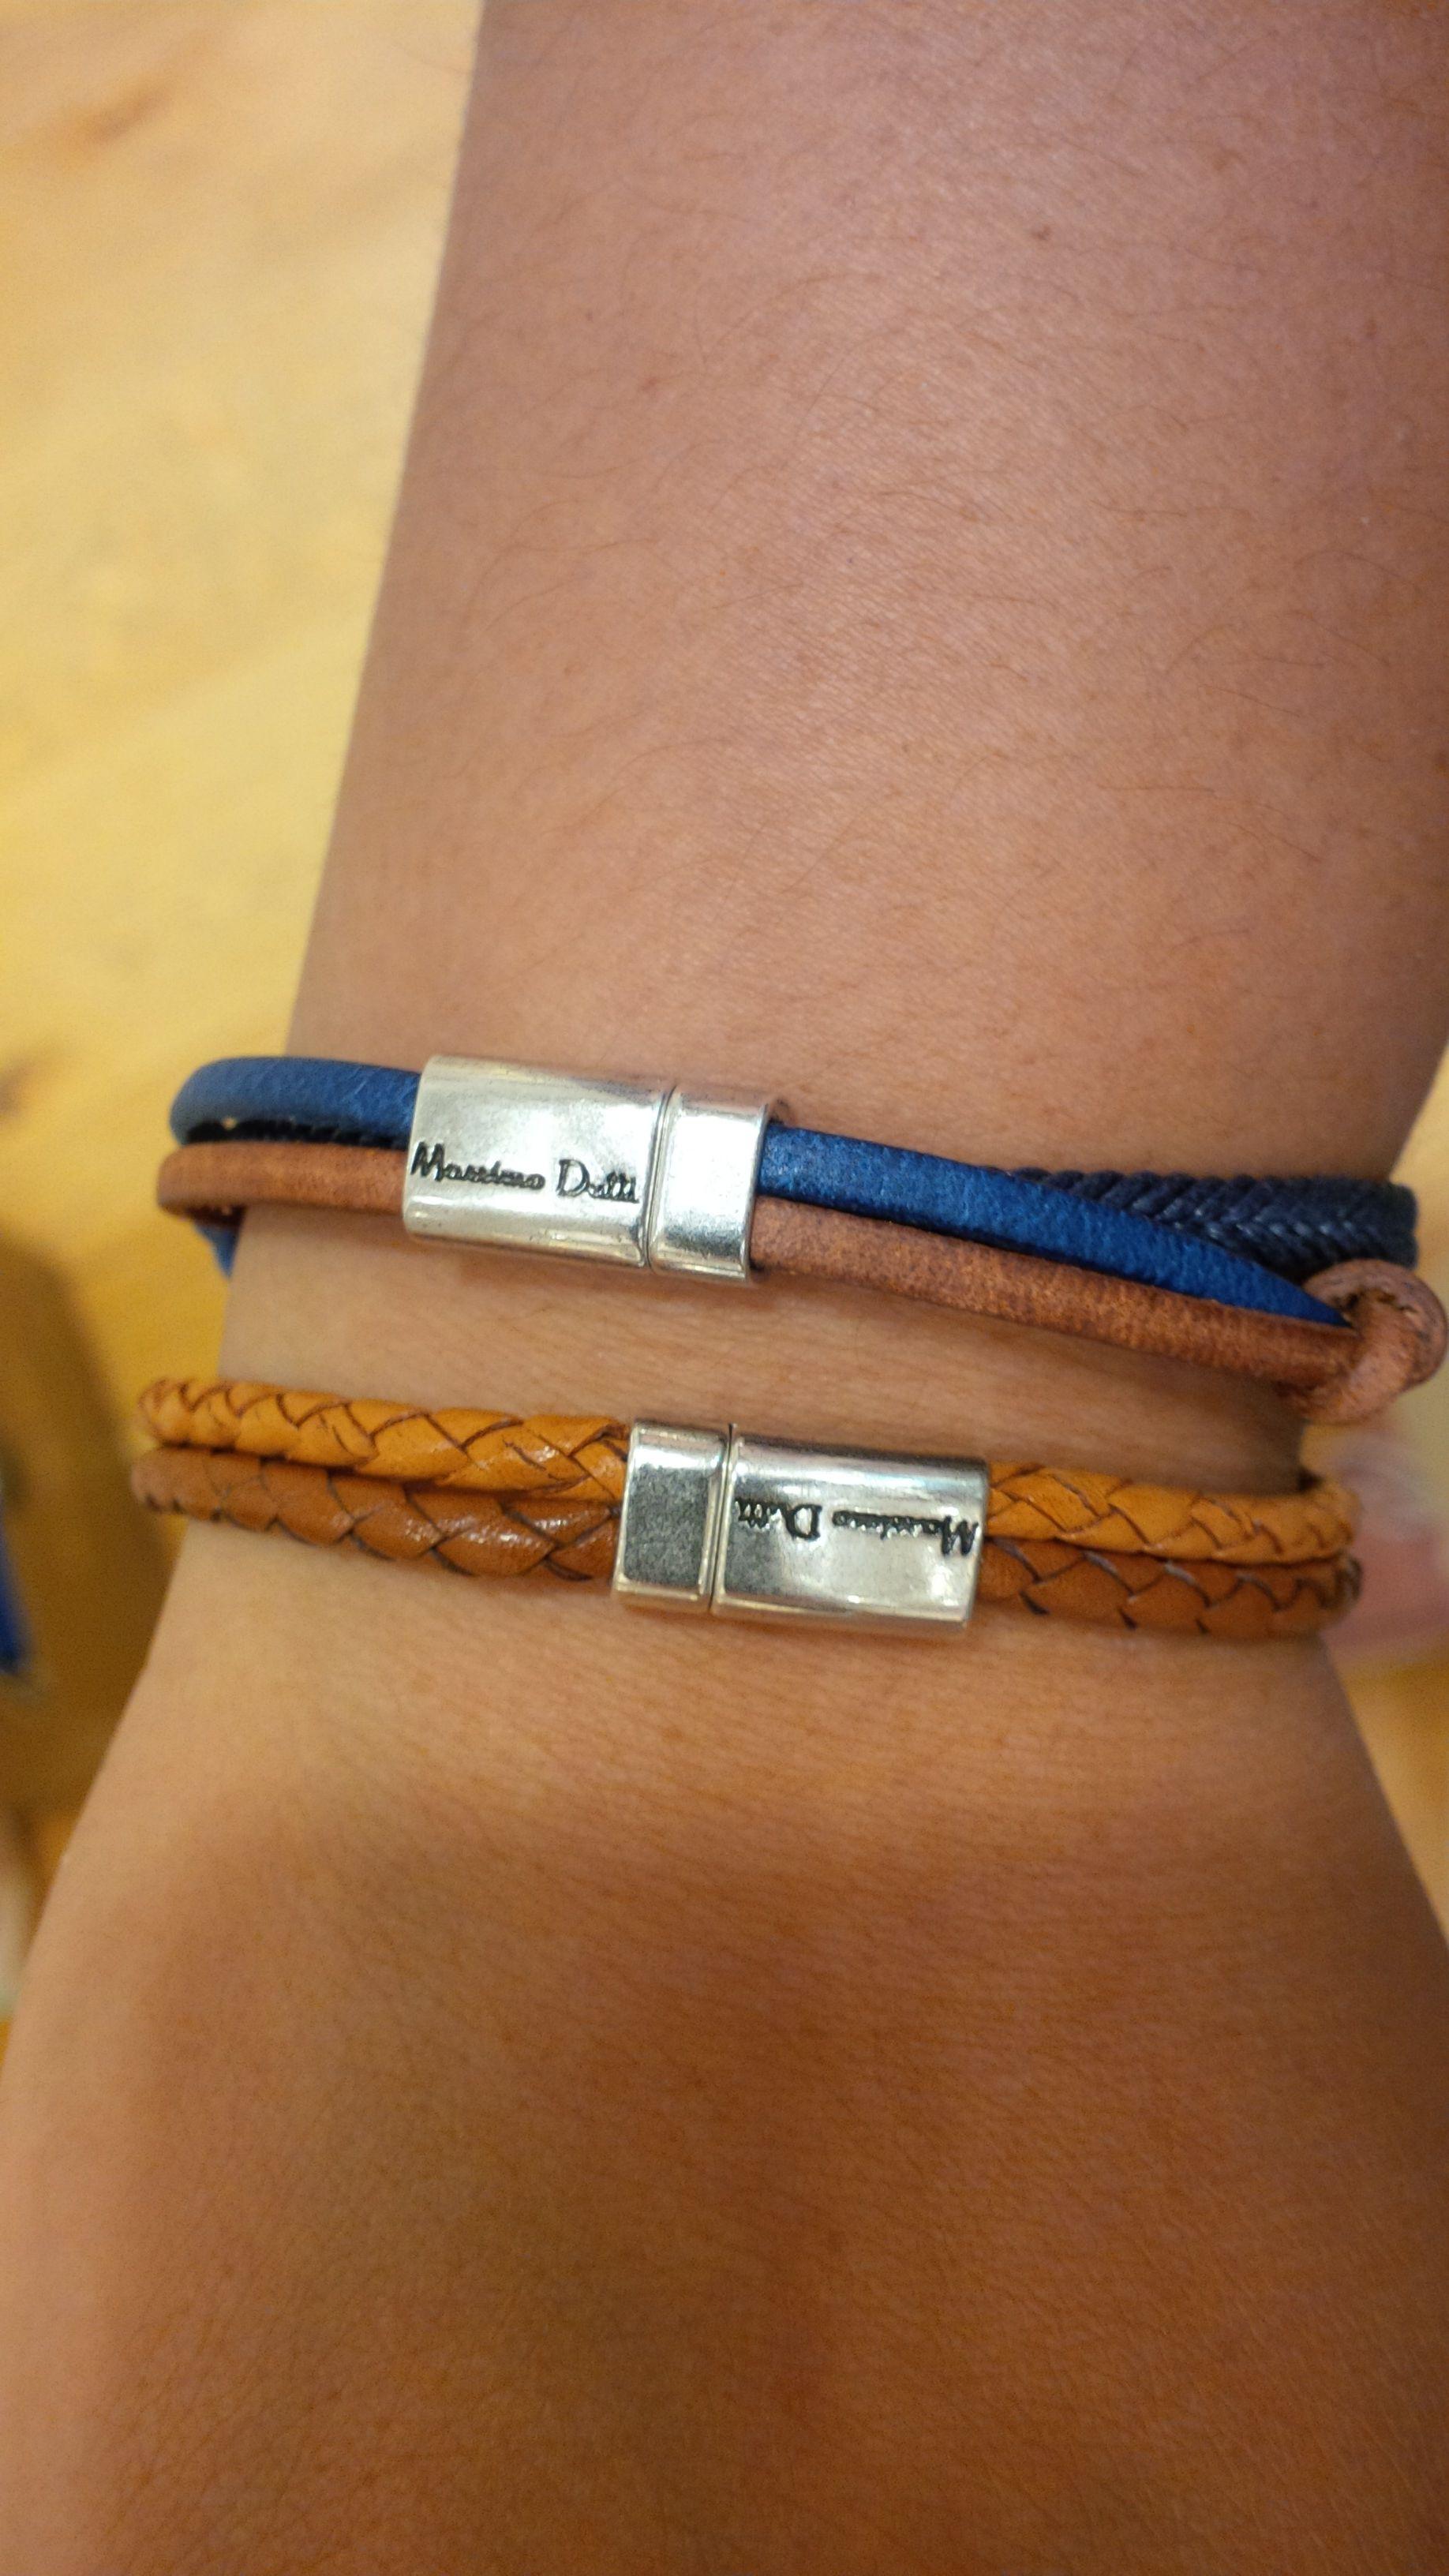 6b89791f94e3b Massimo dutti leather bracelets for men | My Style | Bracelets for ...